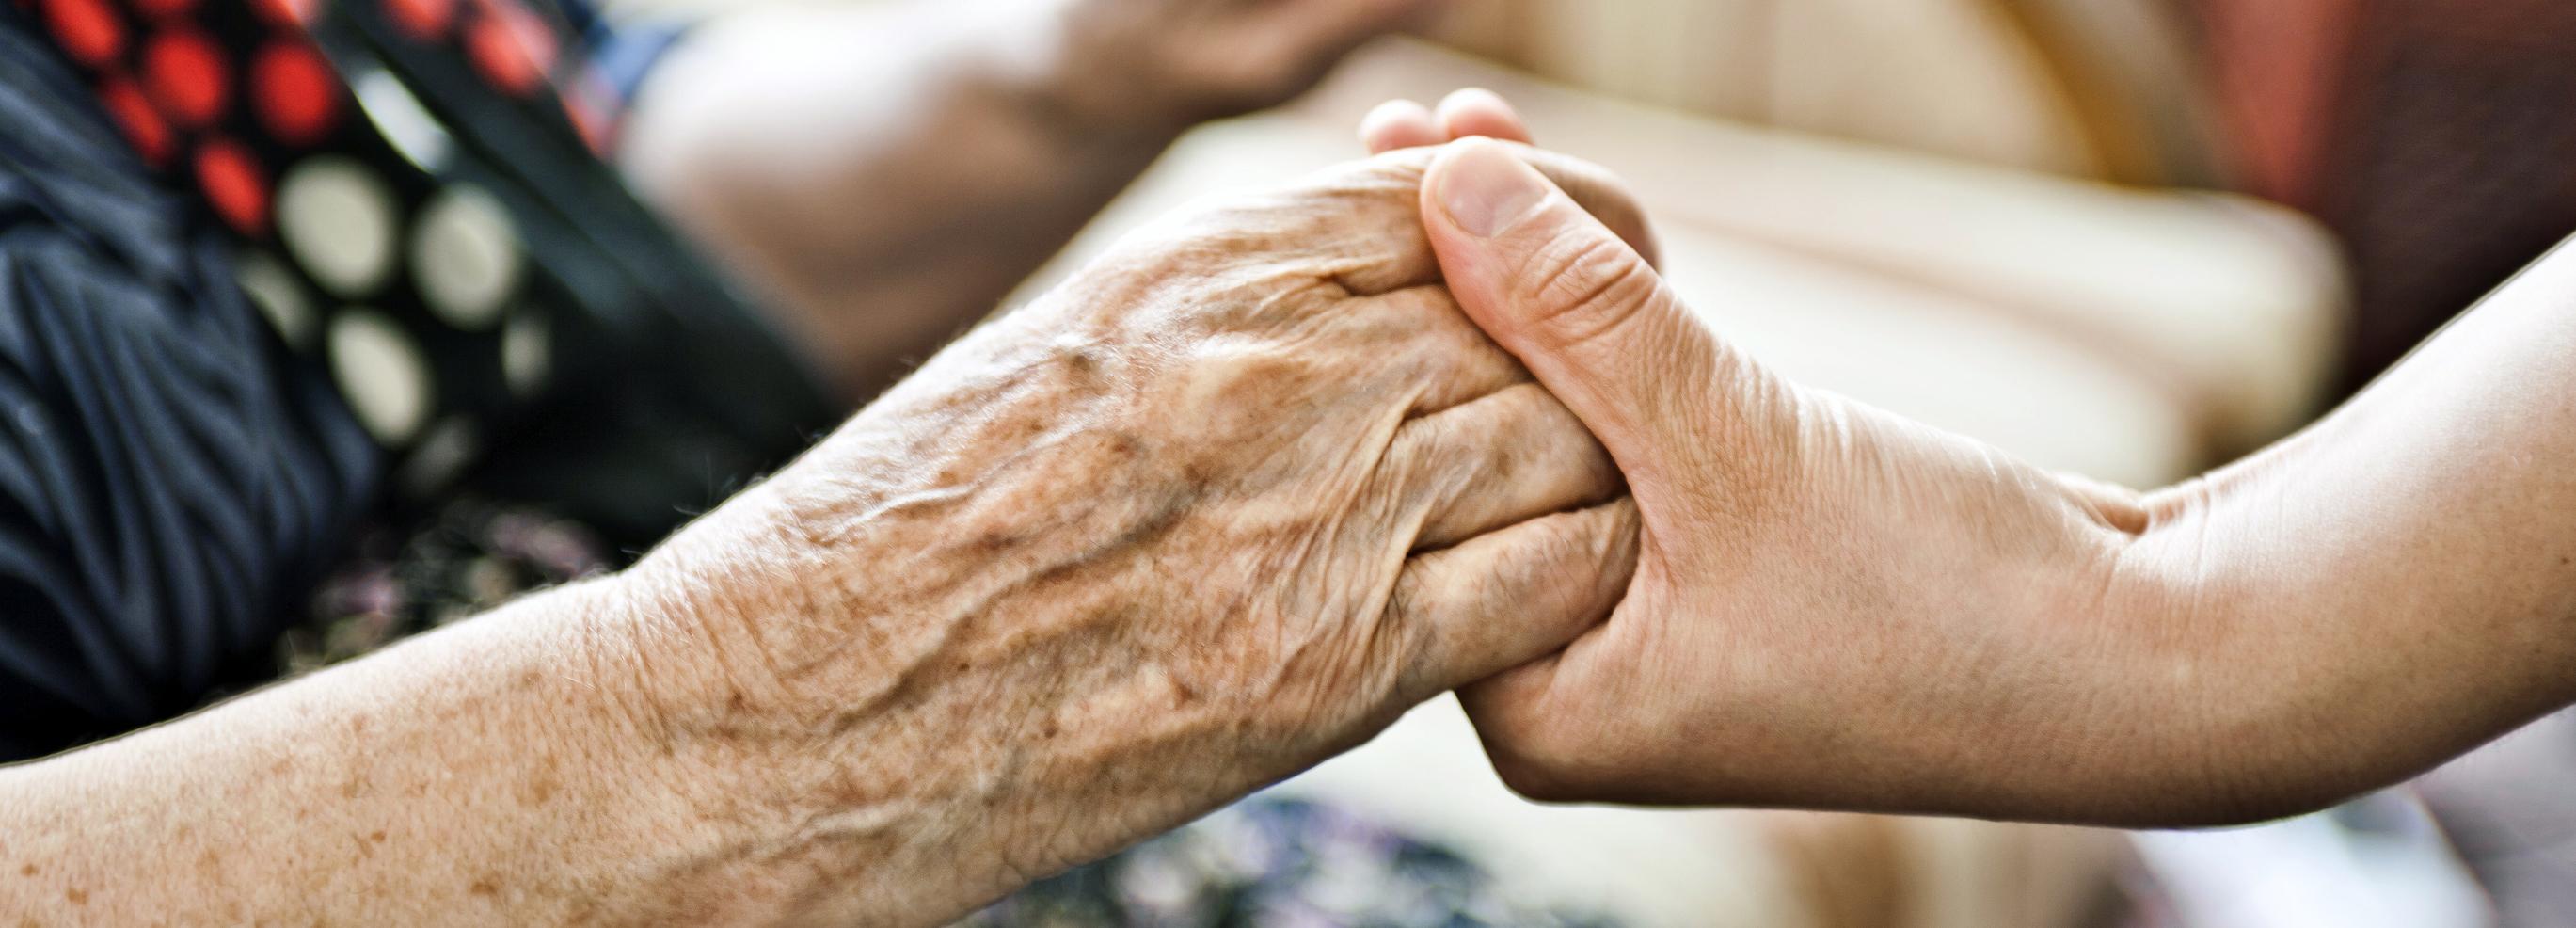 Younger adult holding older adult's hands